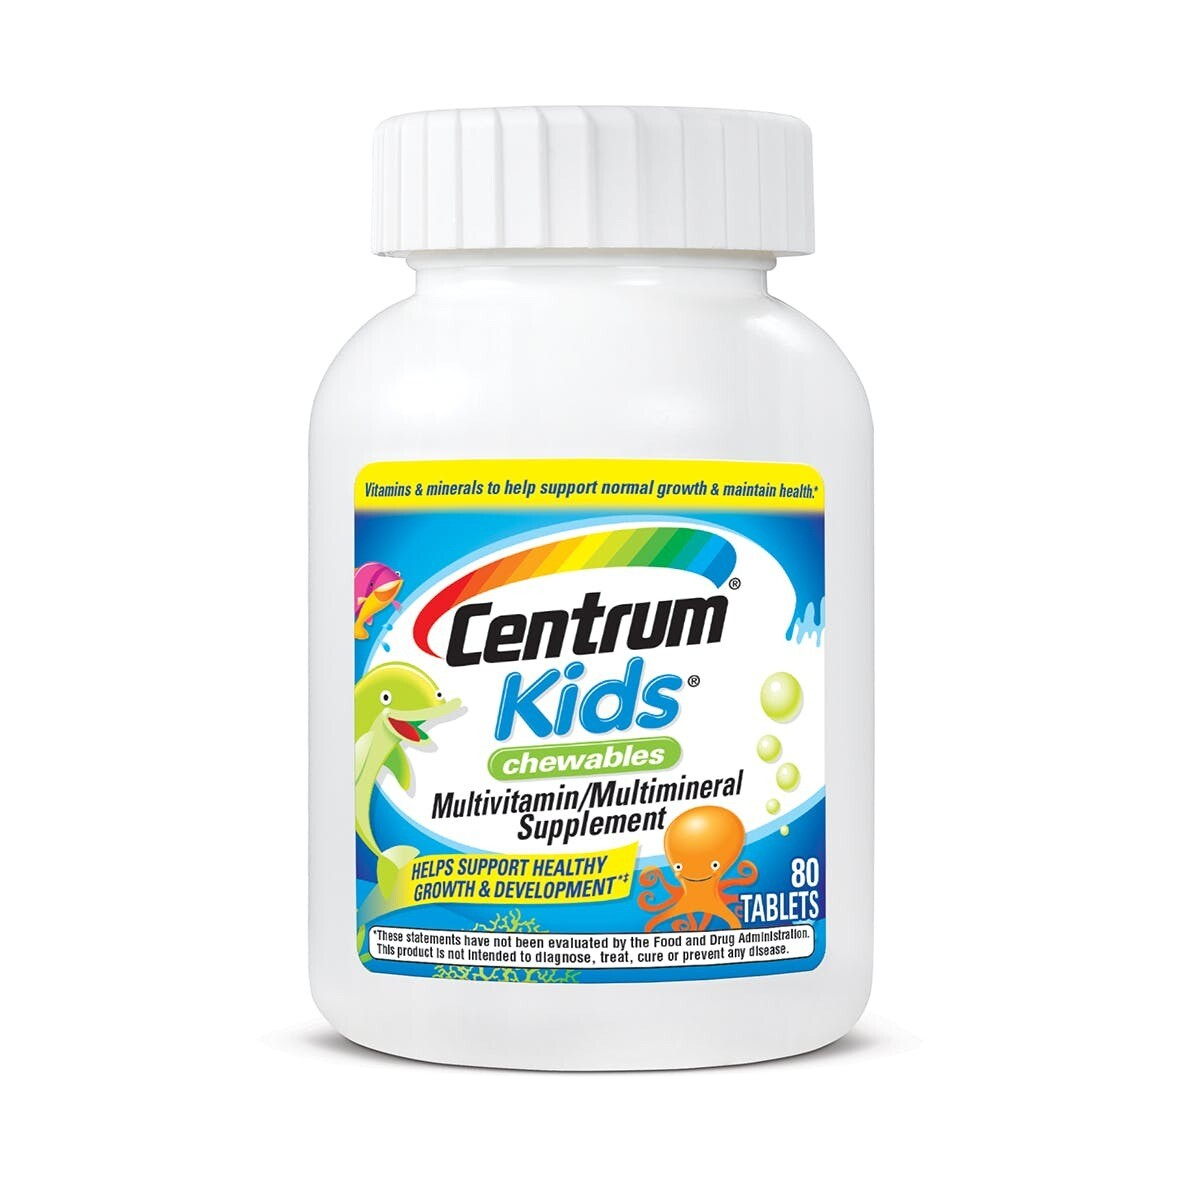 Centrum Kids Chewable